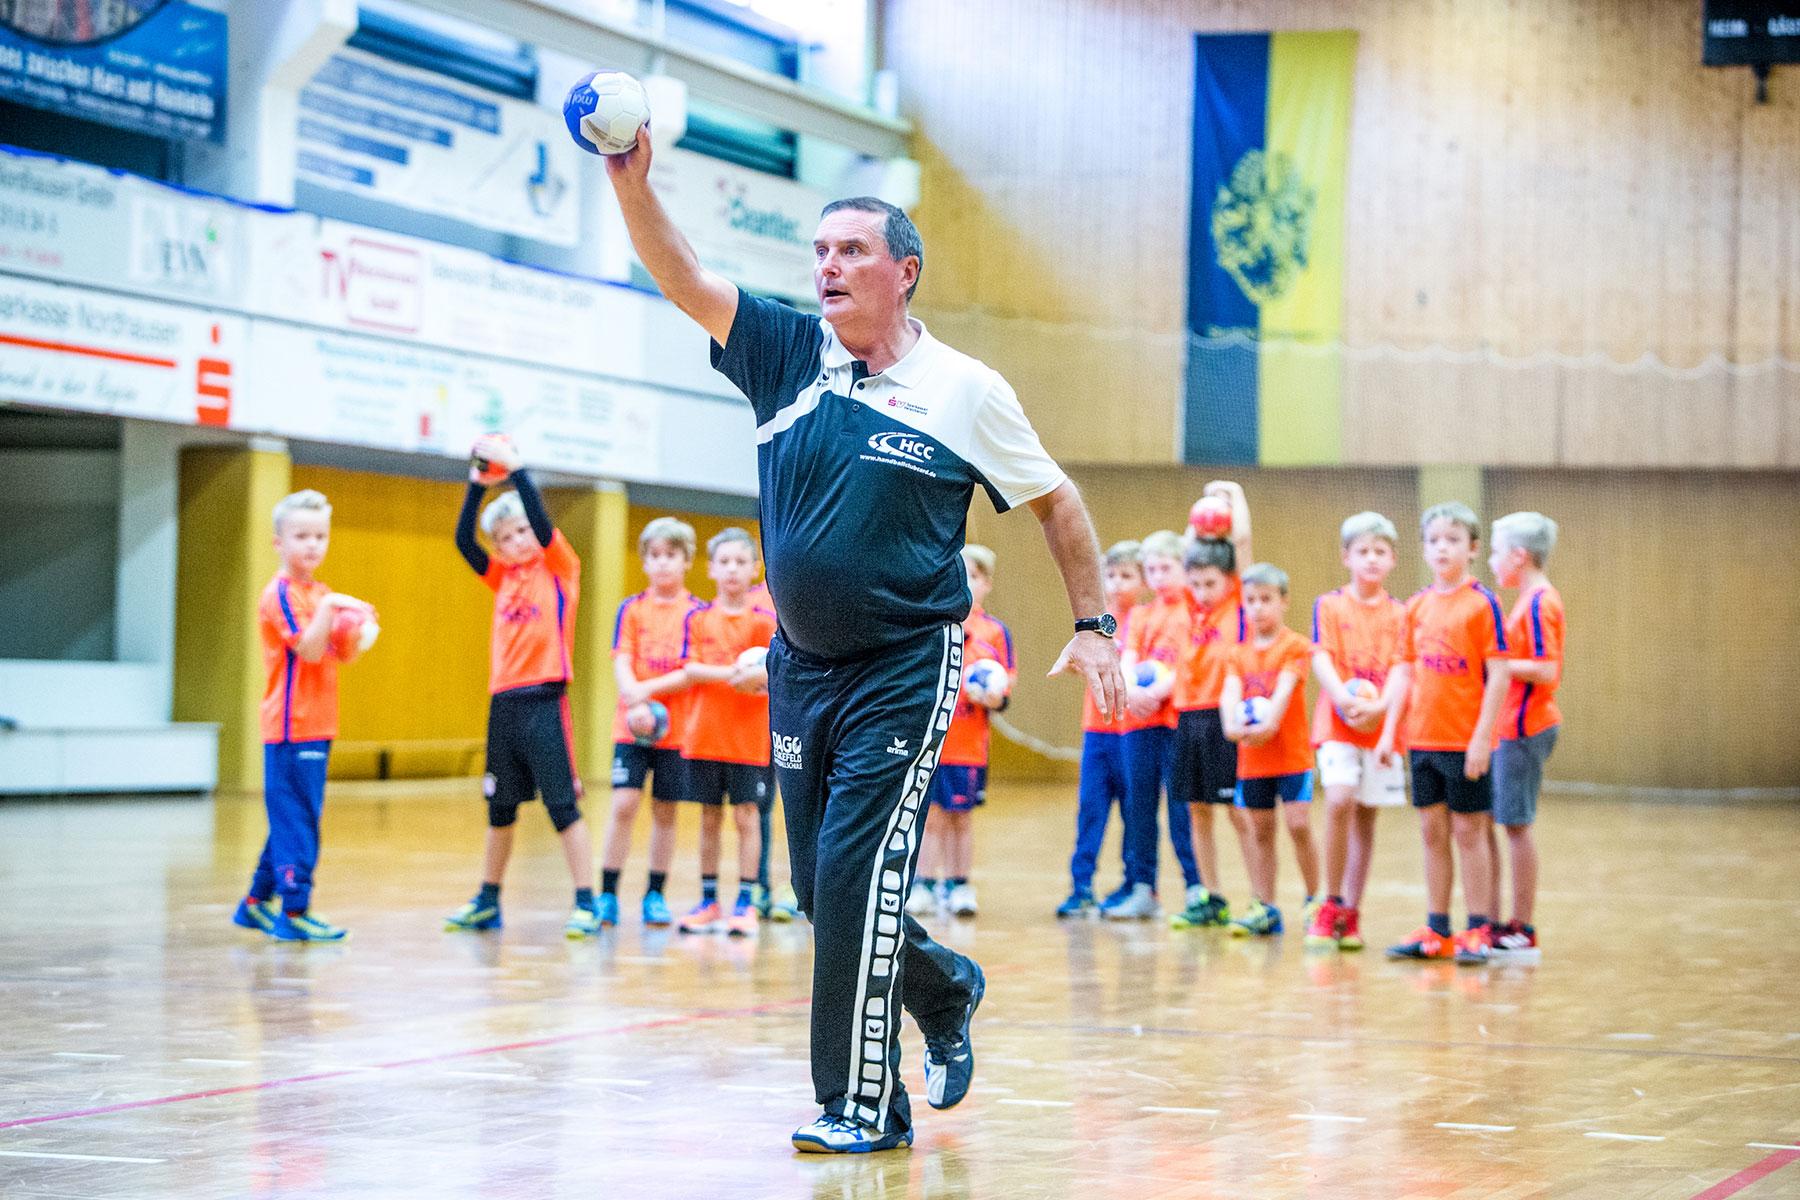 201809_Handballcamp_NDH (8)